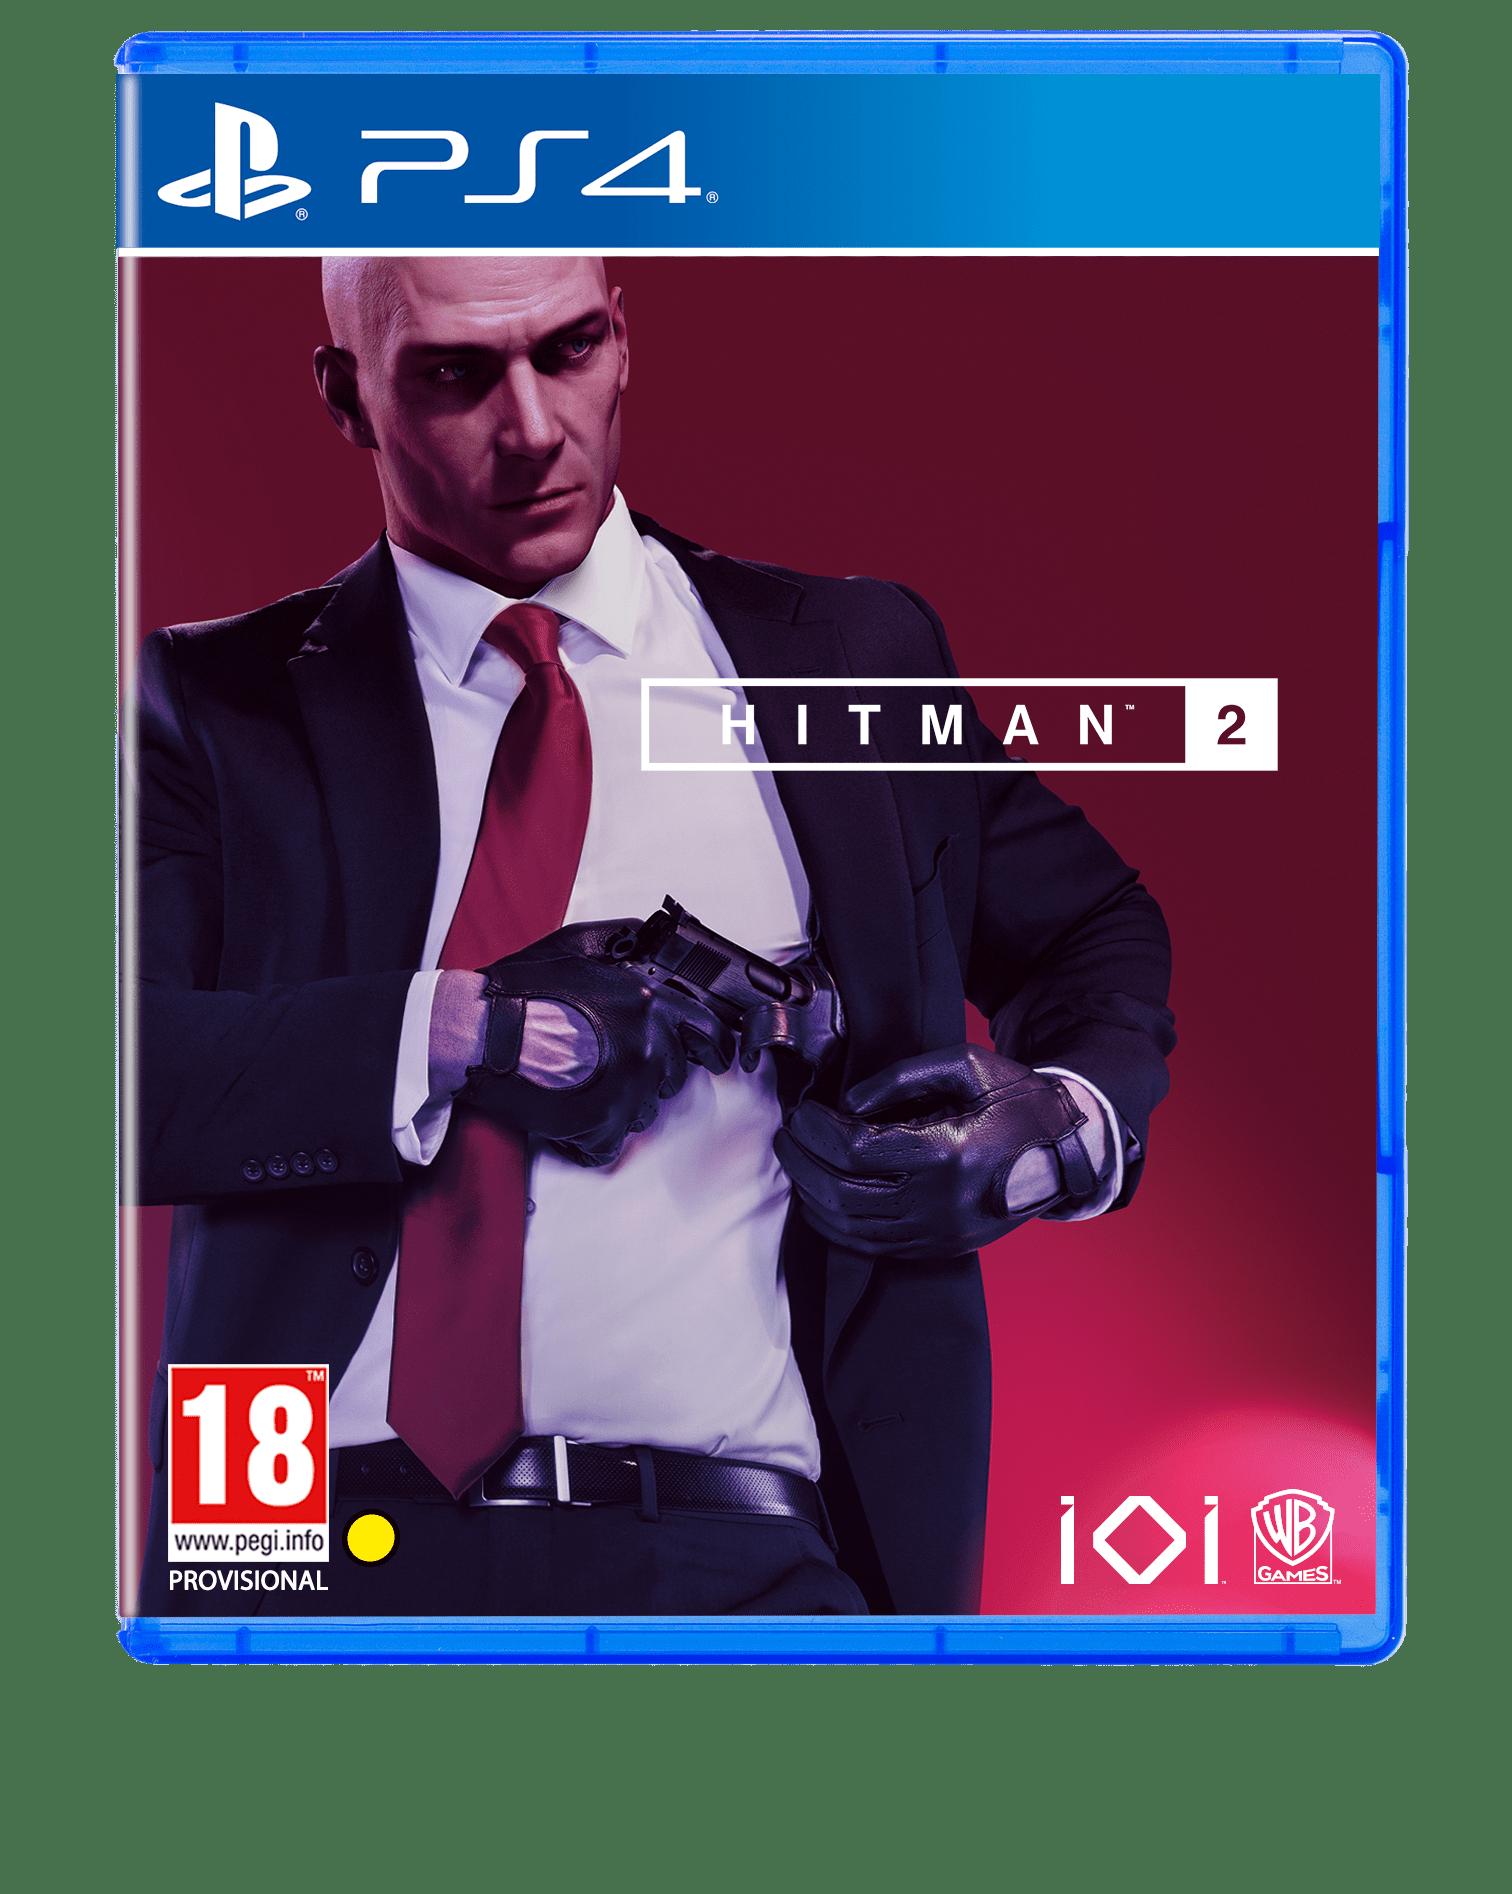 HITMAN 2 PS4 - Warner 1.12.74.05.007